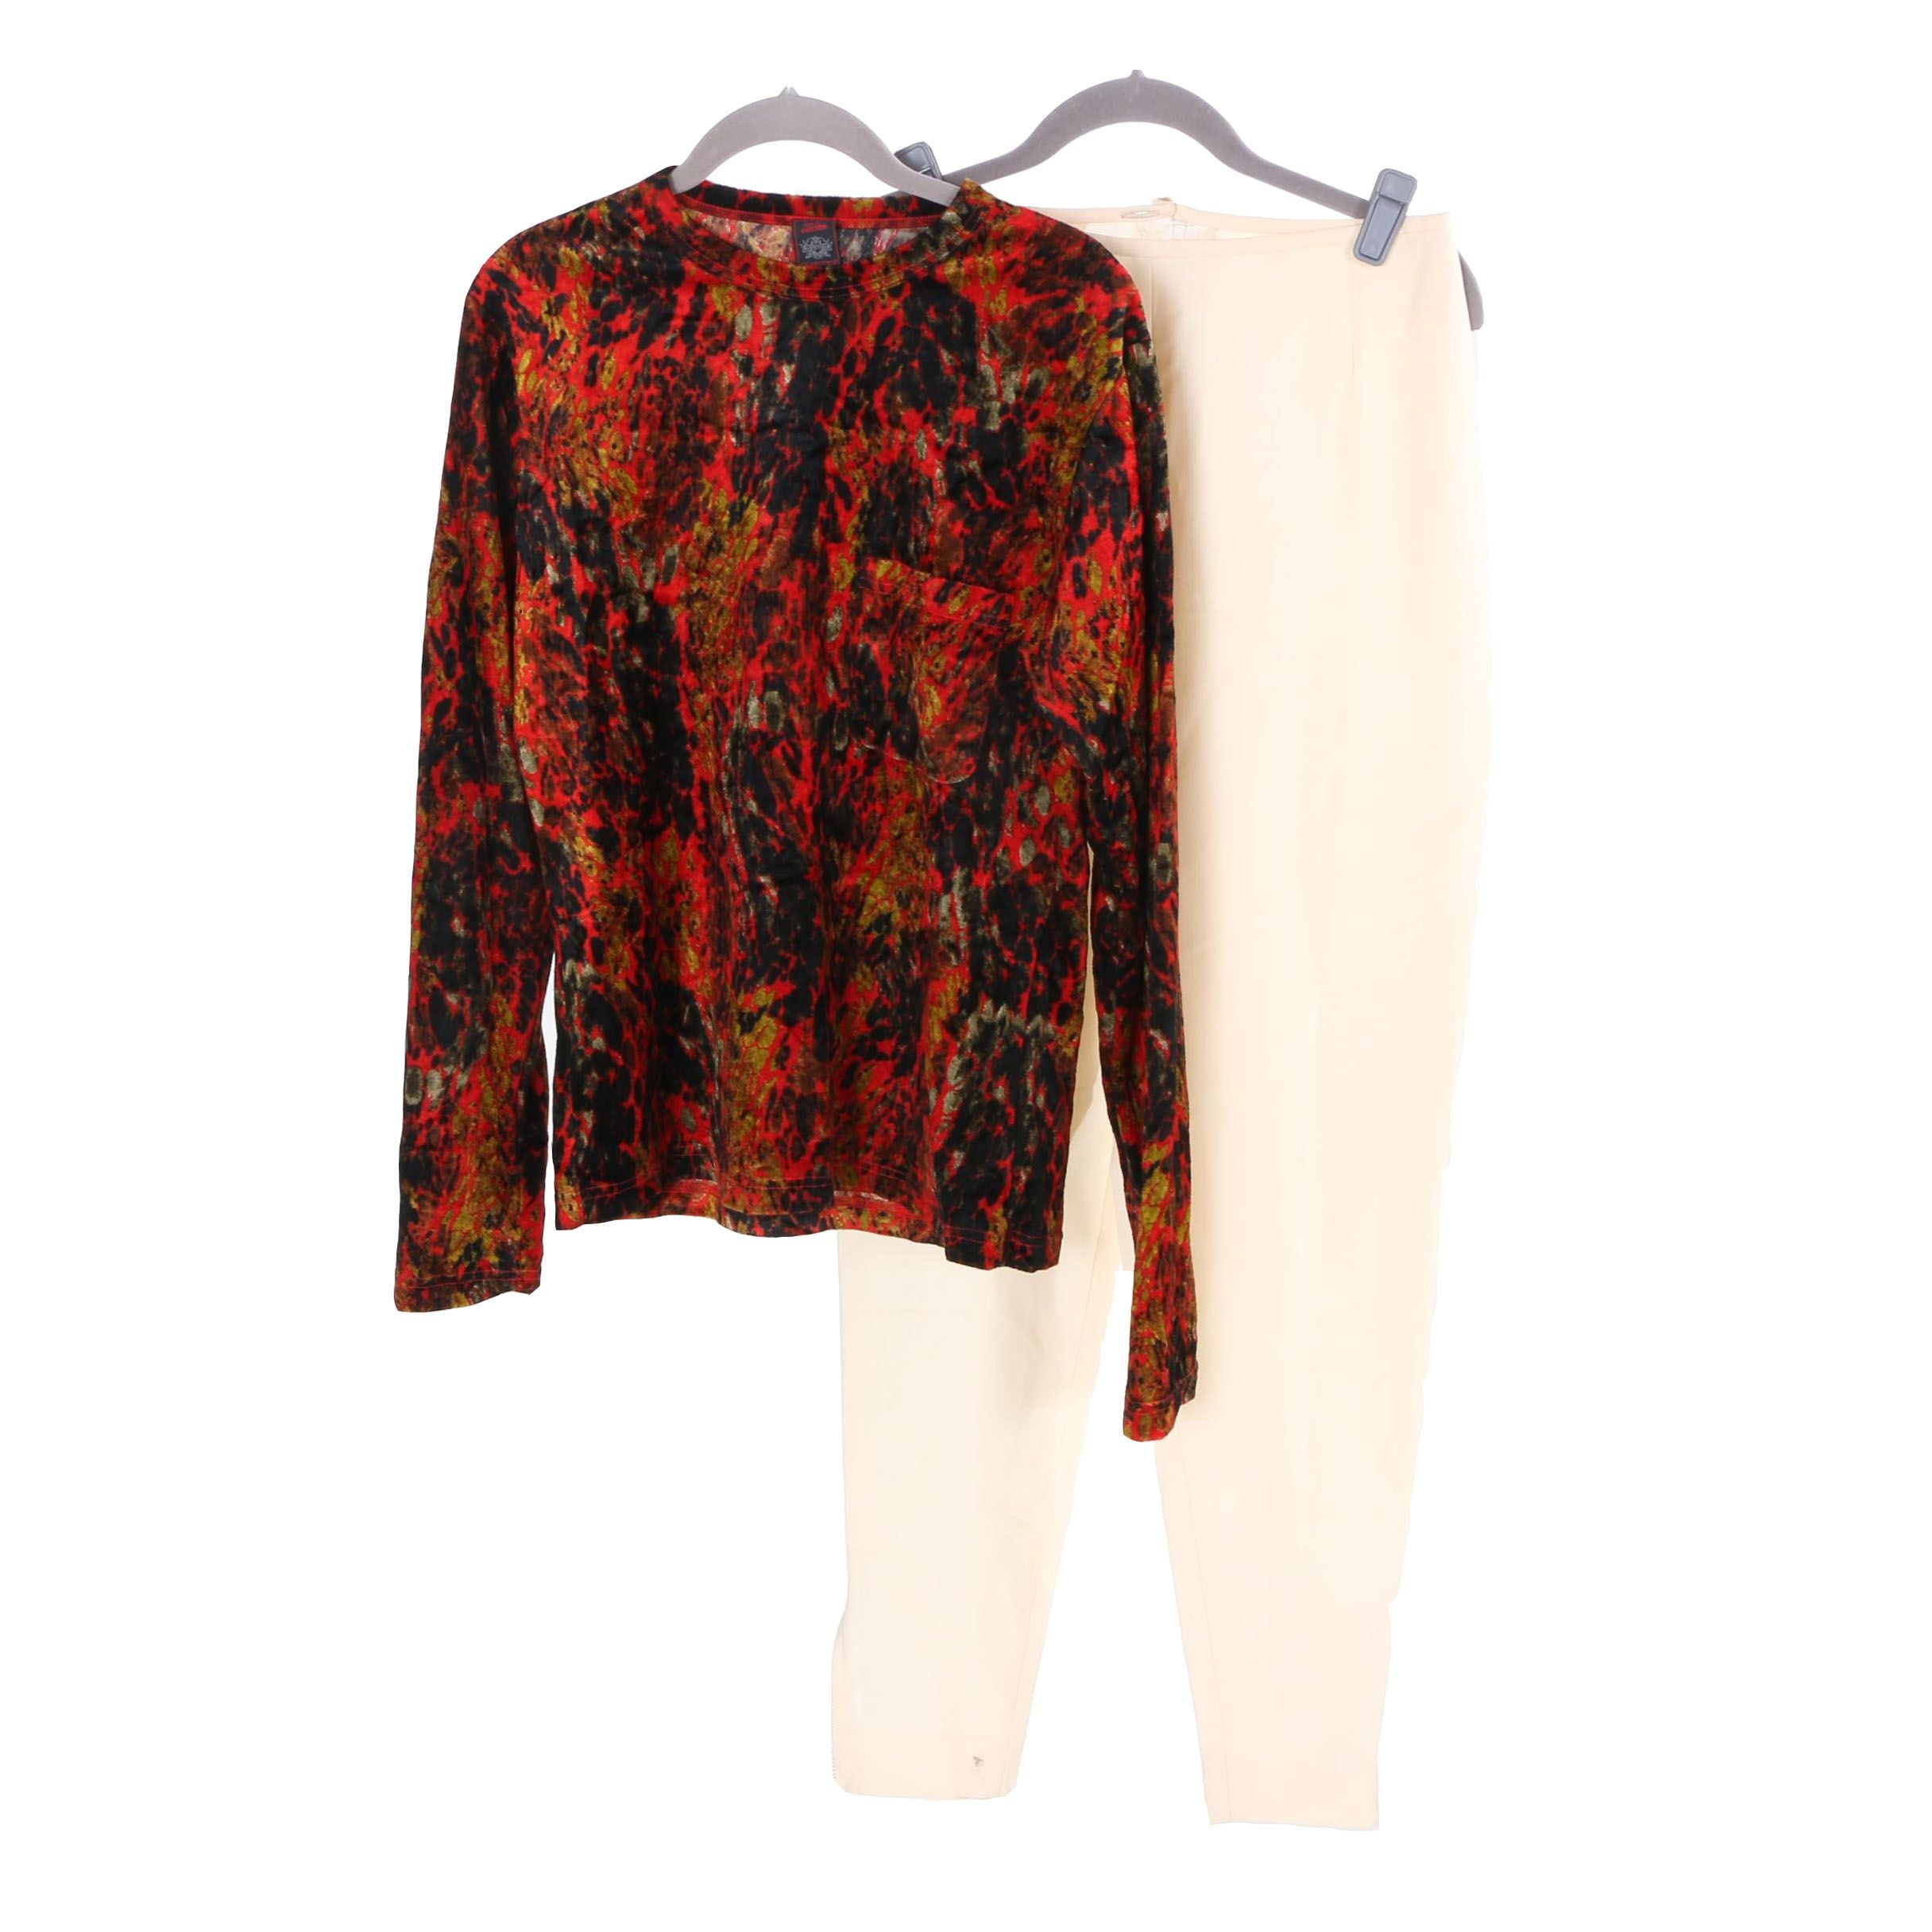 Women's Circa 1980s-Early 2000s Jean Paul Gaultier Clothing